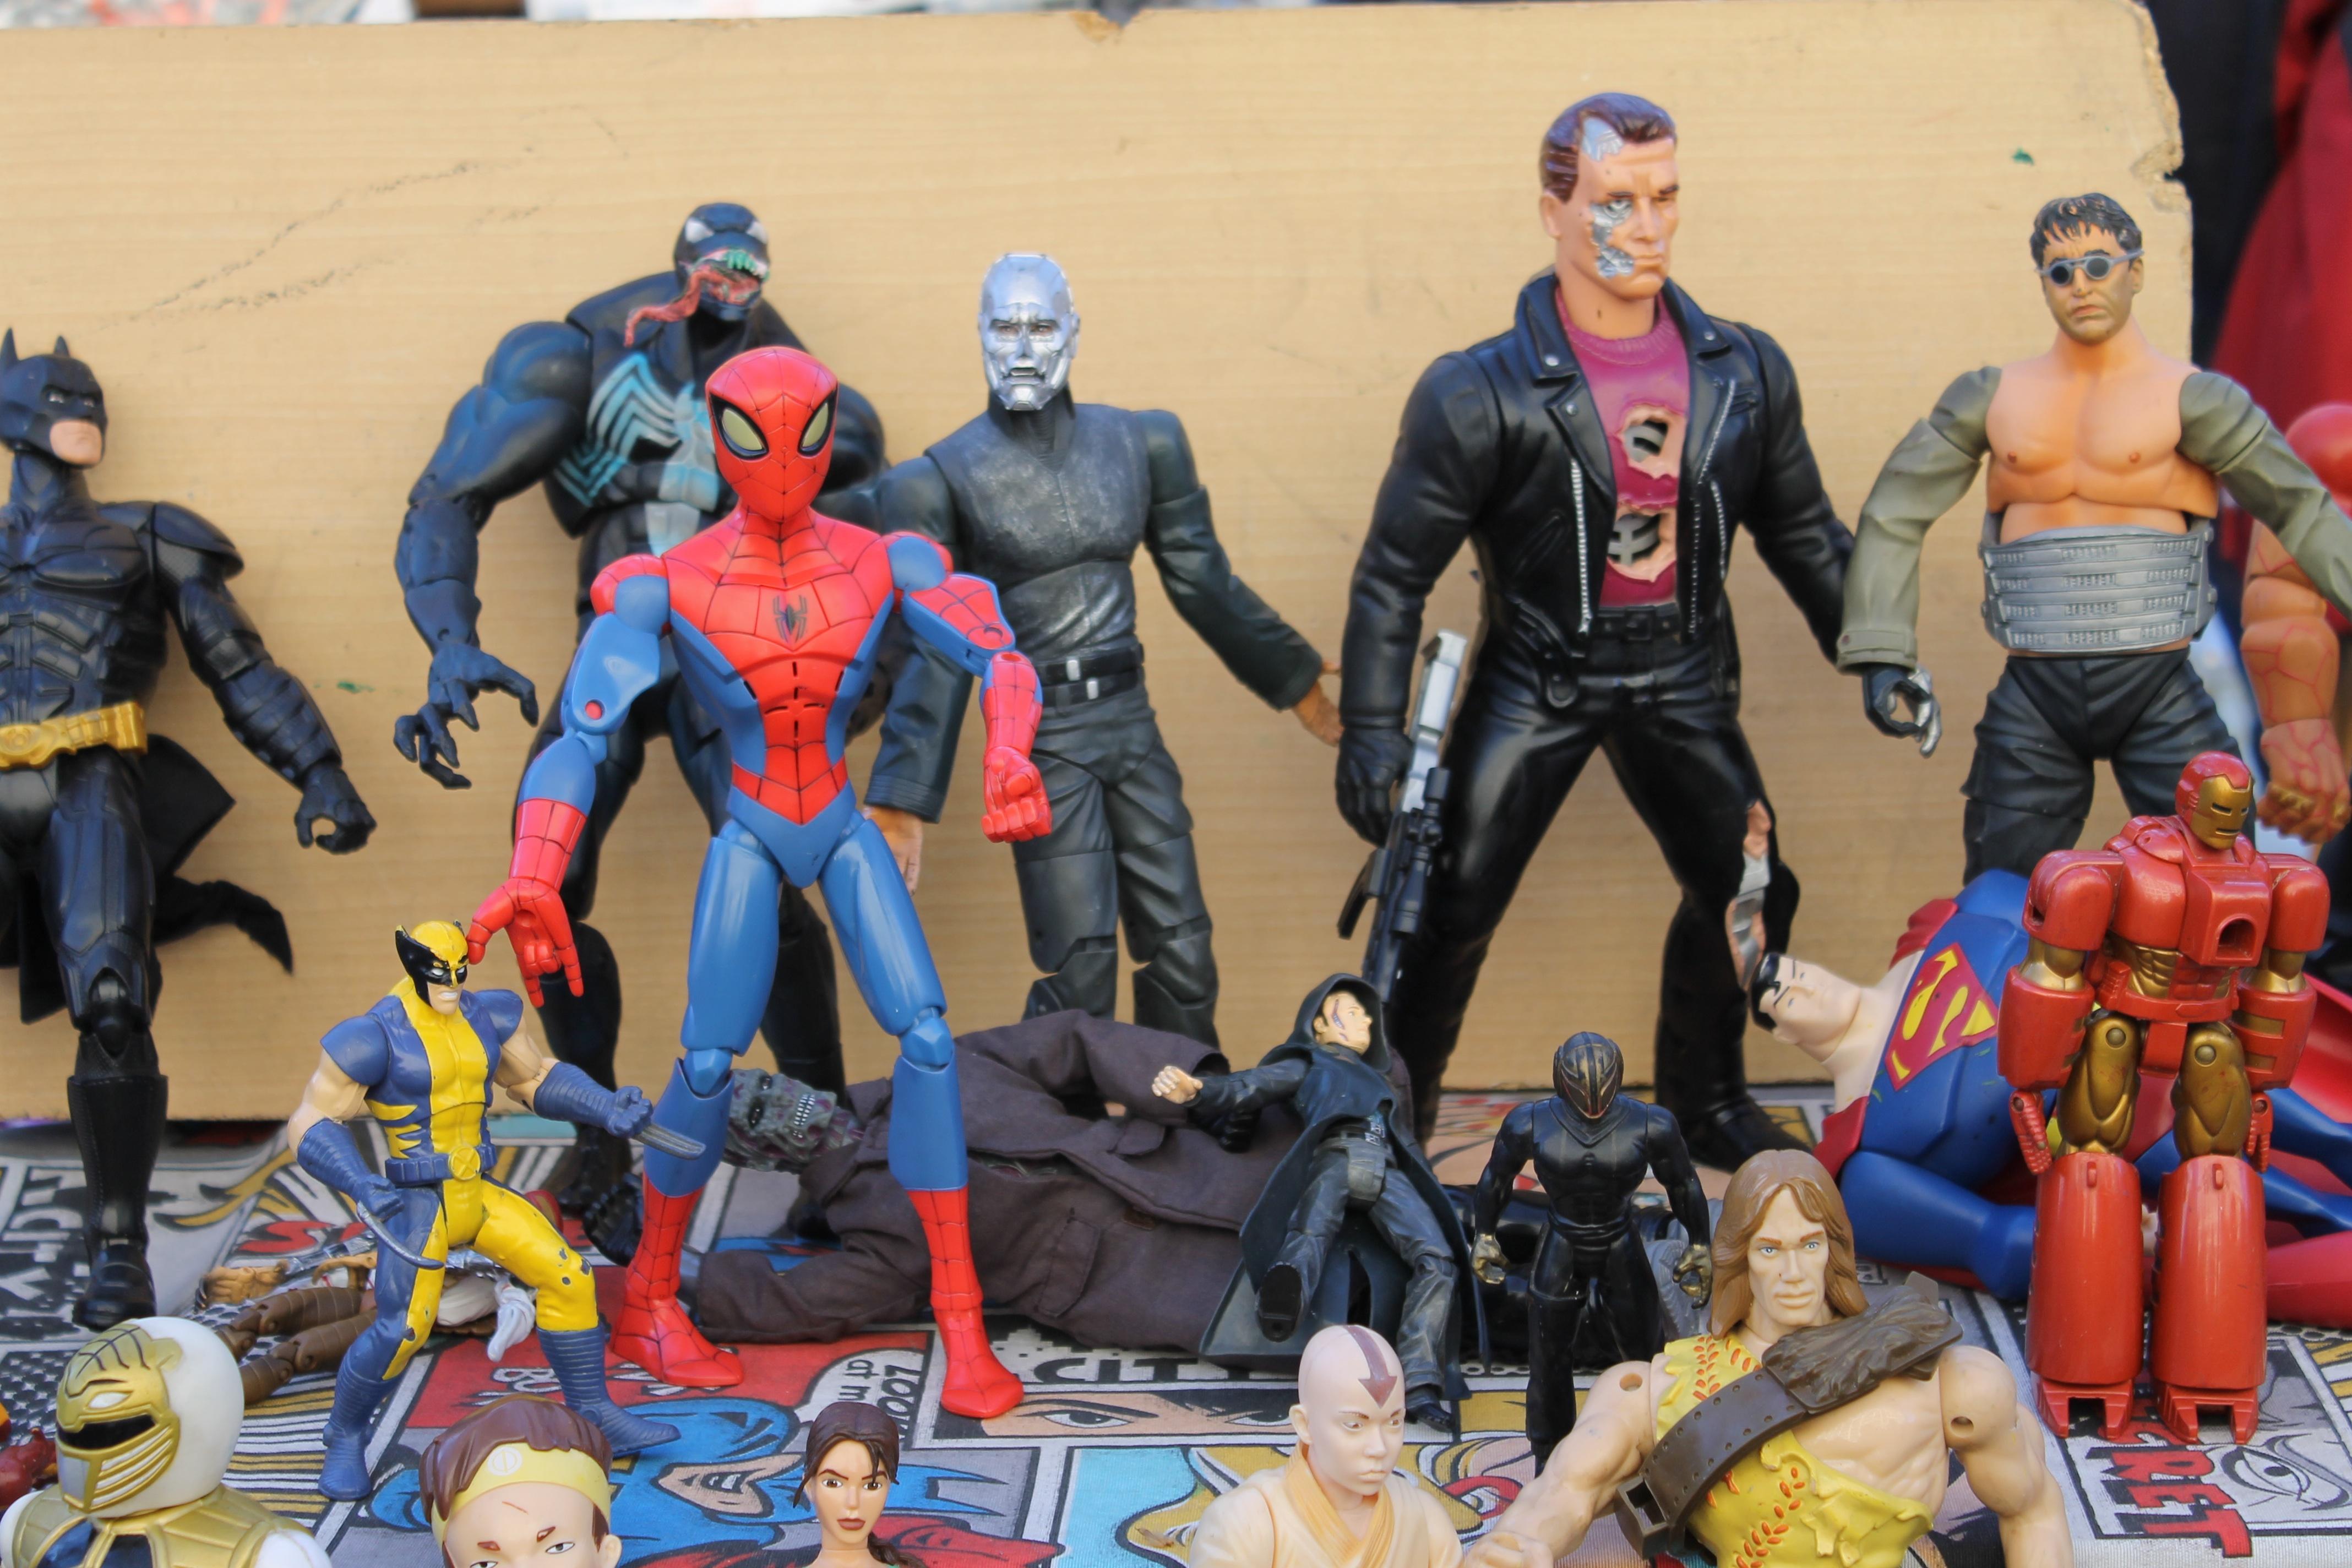 free images   toy  action figure  comics  superhero 4272x2848 - - 54726 - free stock photos